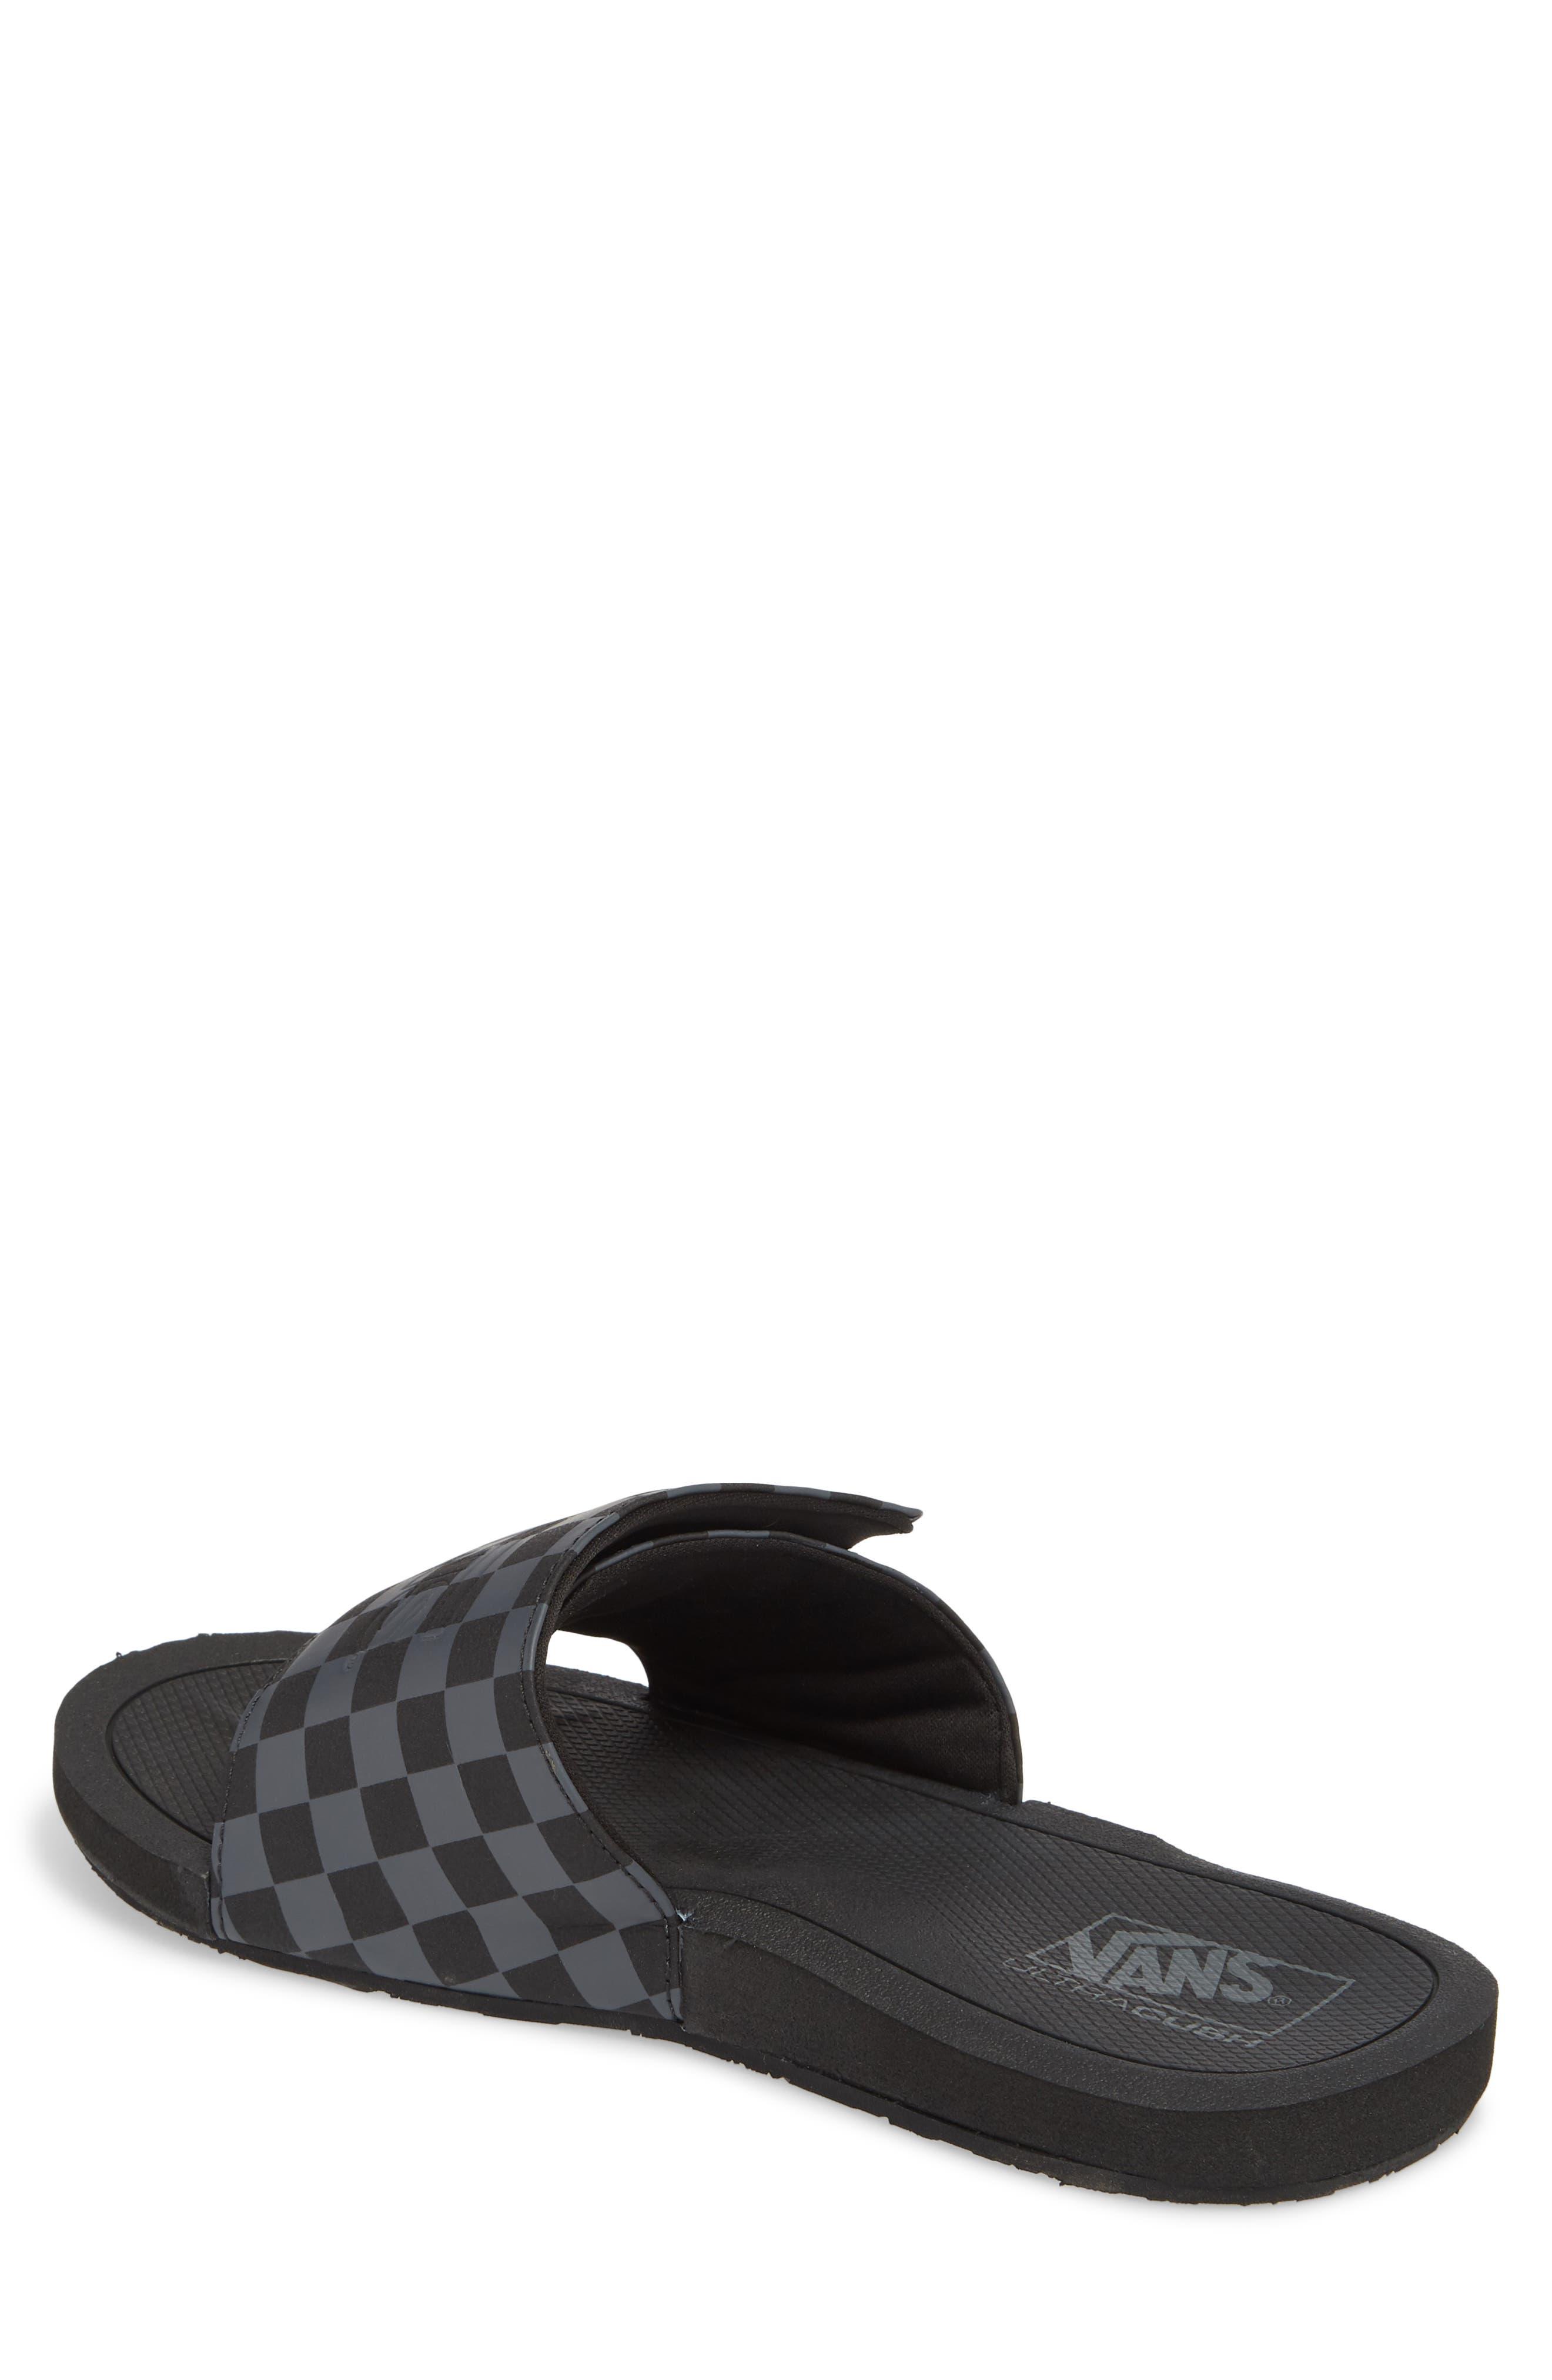 Nexpa Slide Sandal,                             Alternate thumbnail 2, color,                             Black/ Asphalt